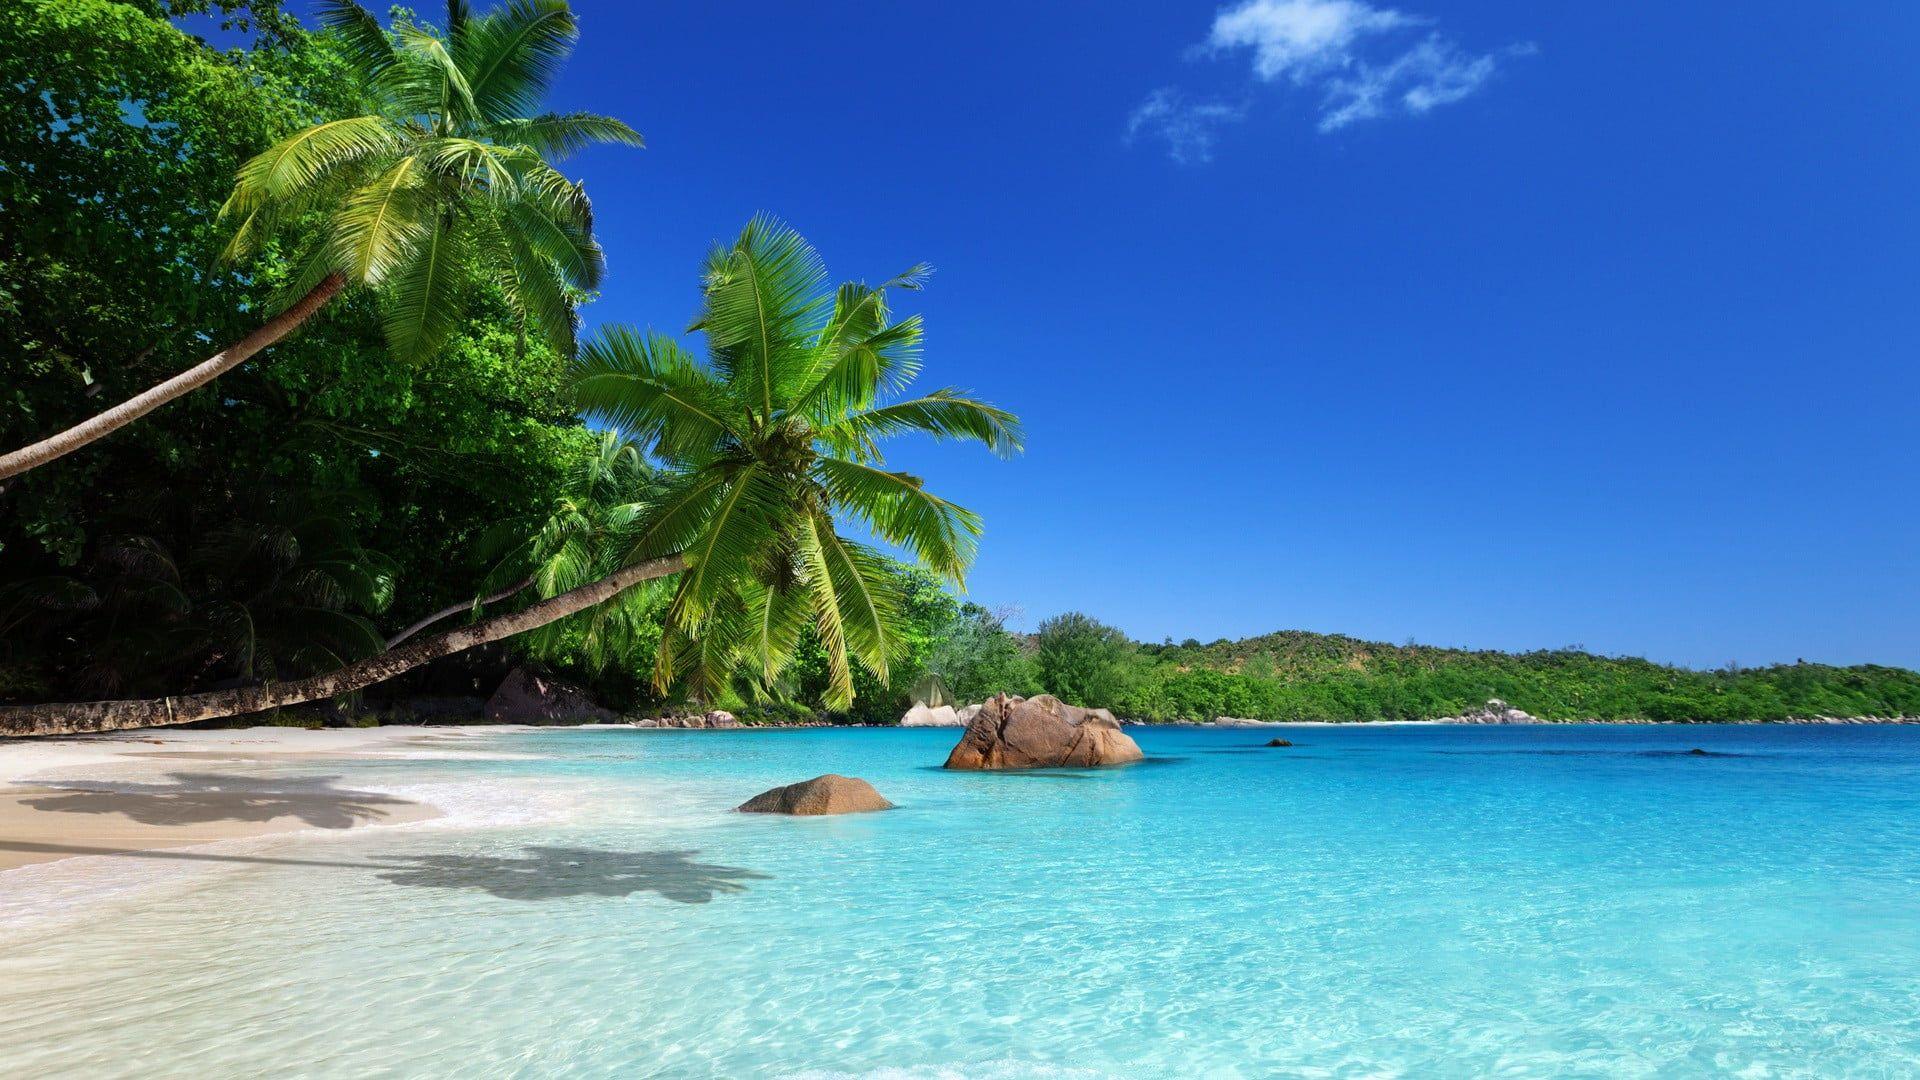 Two Coconut Trees Landscape Beach Palm Trees Tropical Sea 1080p Wallpaper Hdwallpaper De Tropical Paradise Wallpaper Landscape Beach Paradise Wallpaper Desktop wallpaper beach paradise